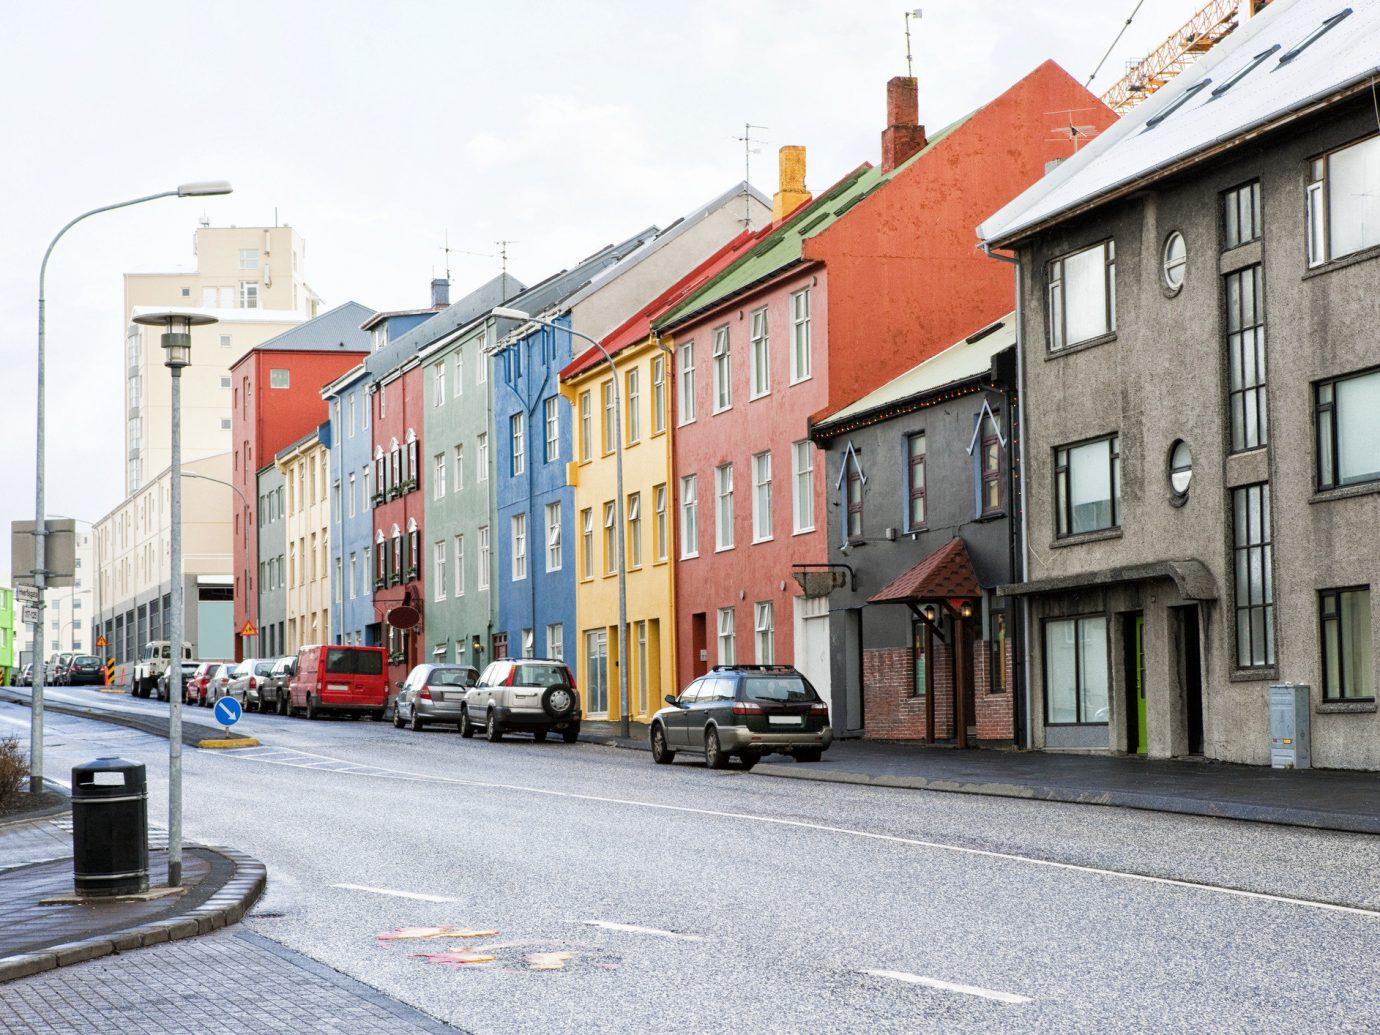 Row of houses in Reykjavik Iceland